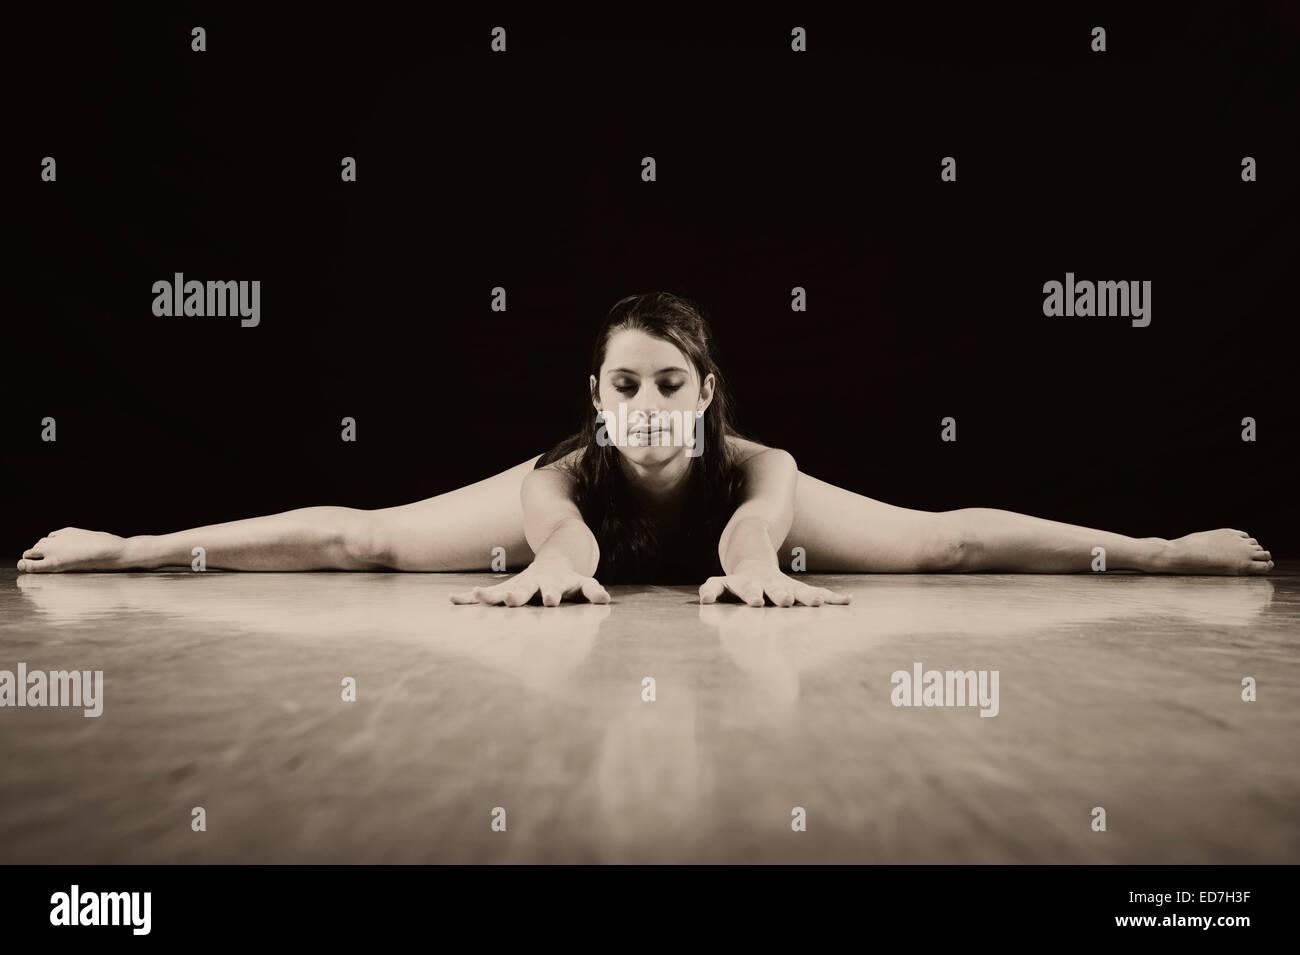 Young woman doing the splits, acrobatics - Stock Image